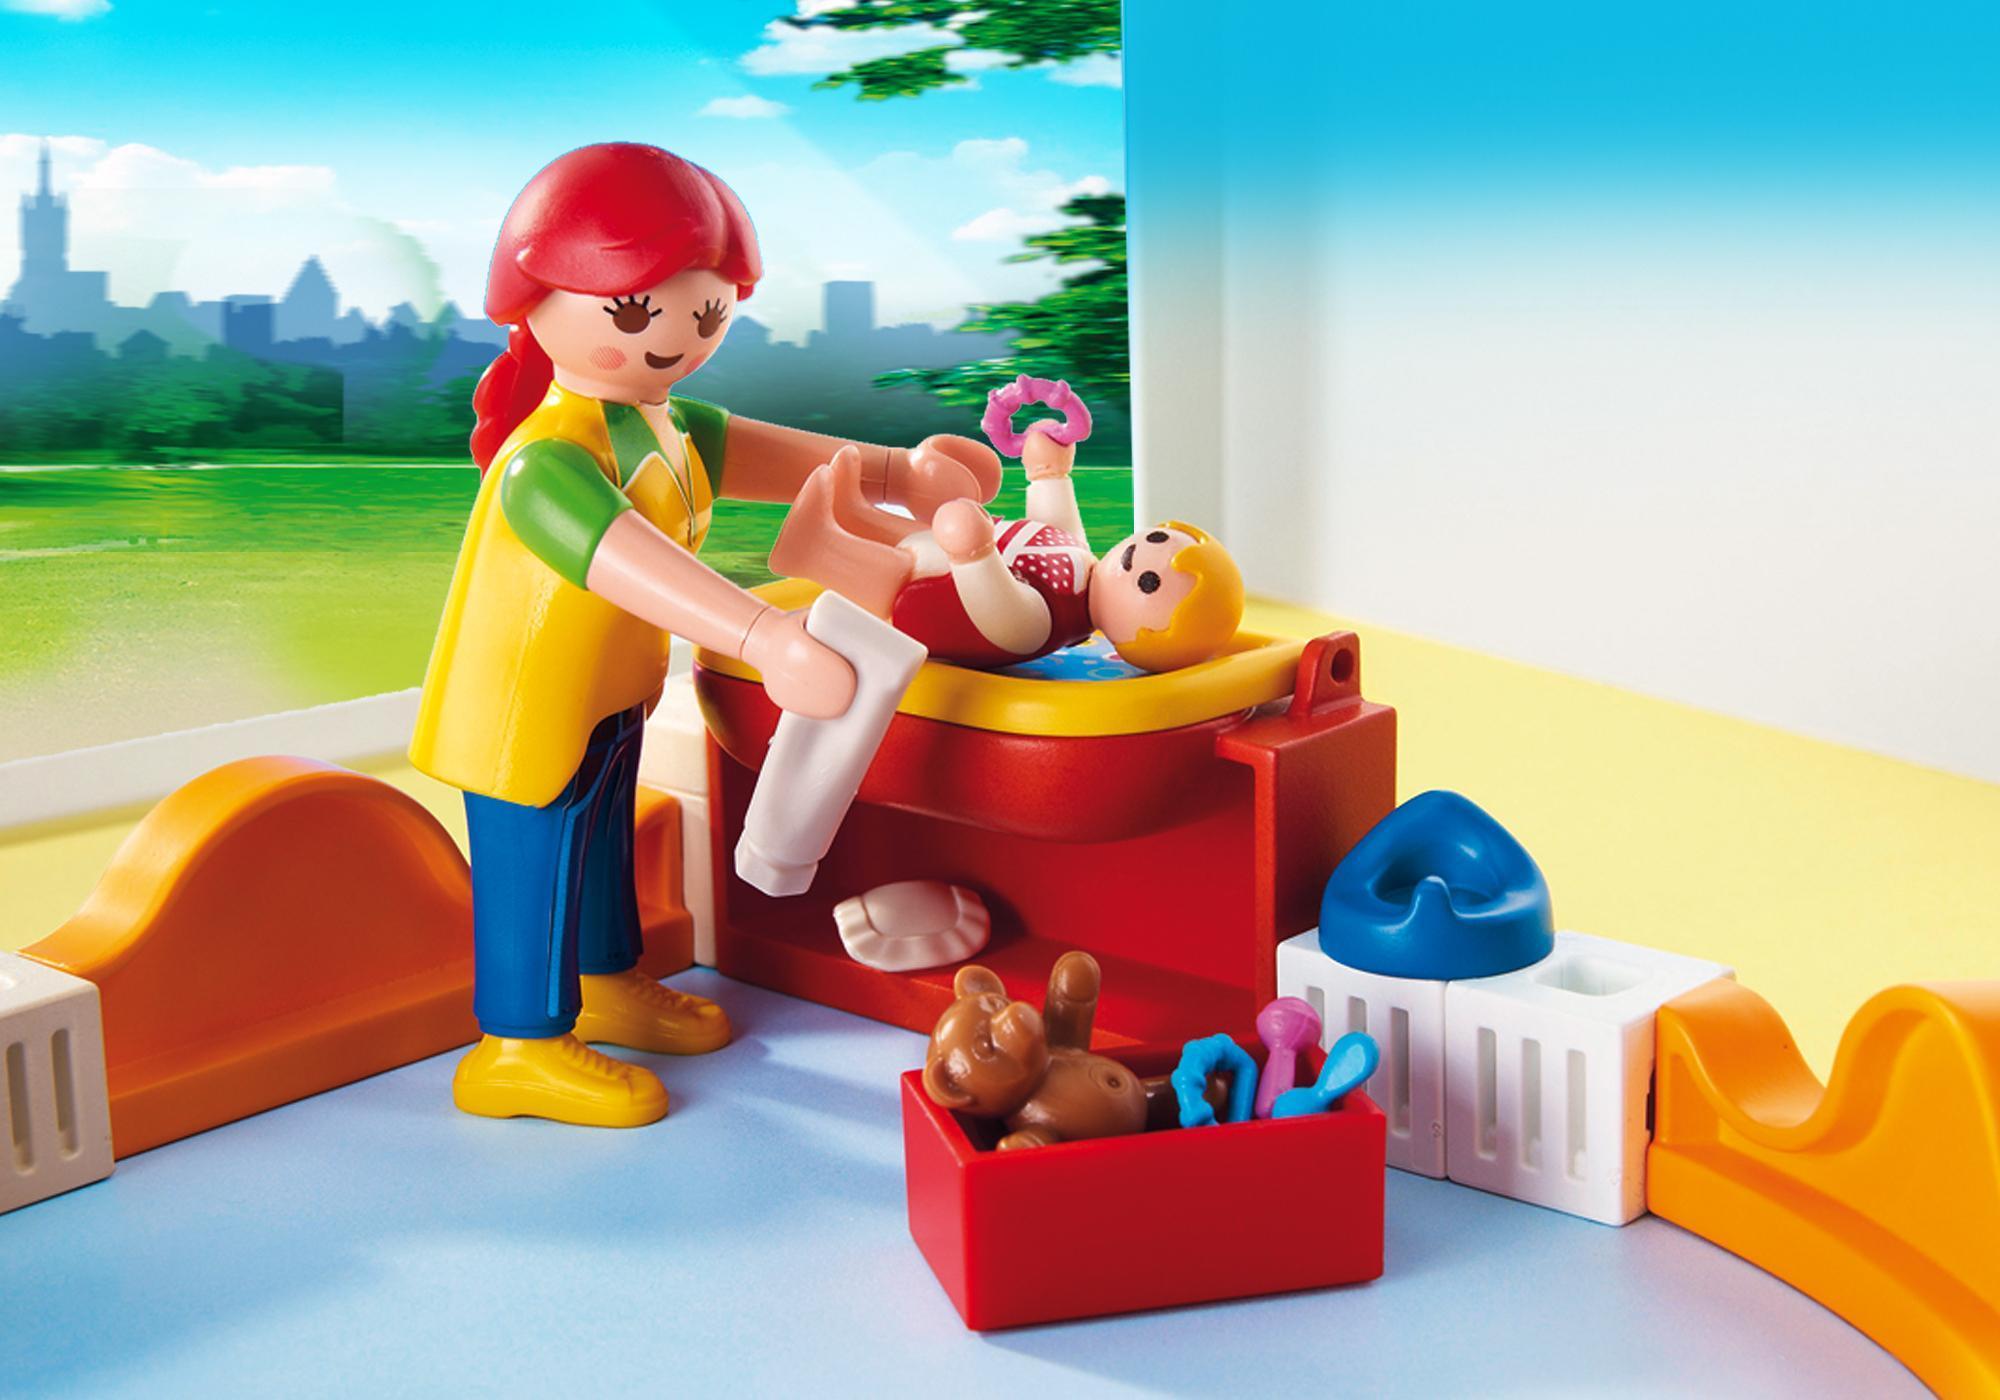 http://media.playmobil.com/i/playmobil/5570_product_extra1